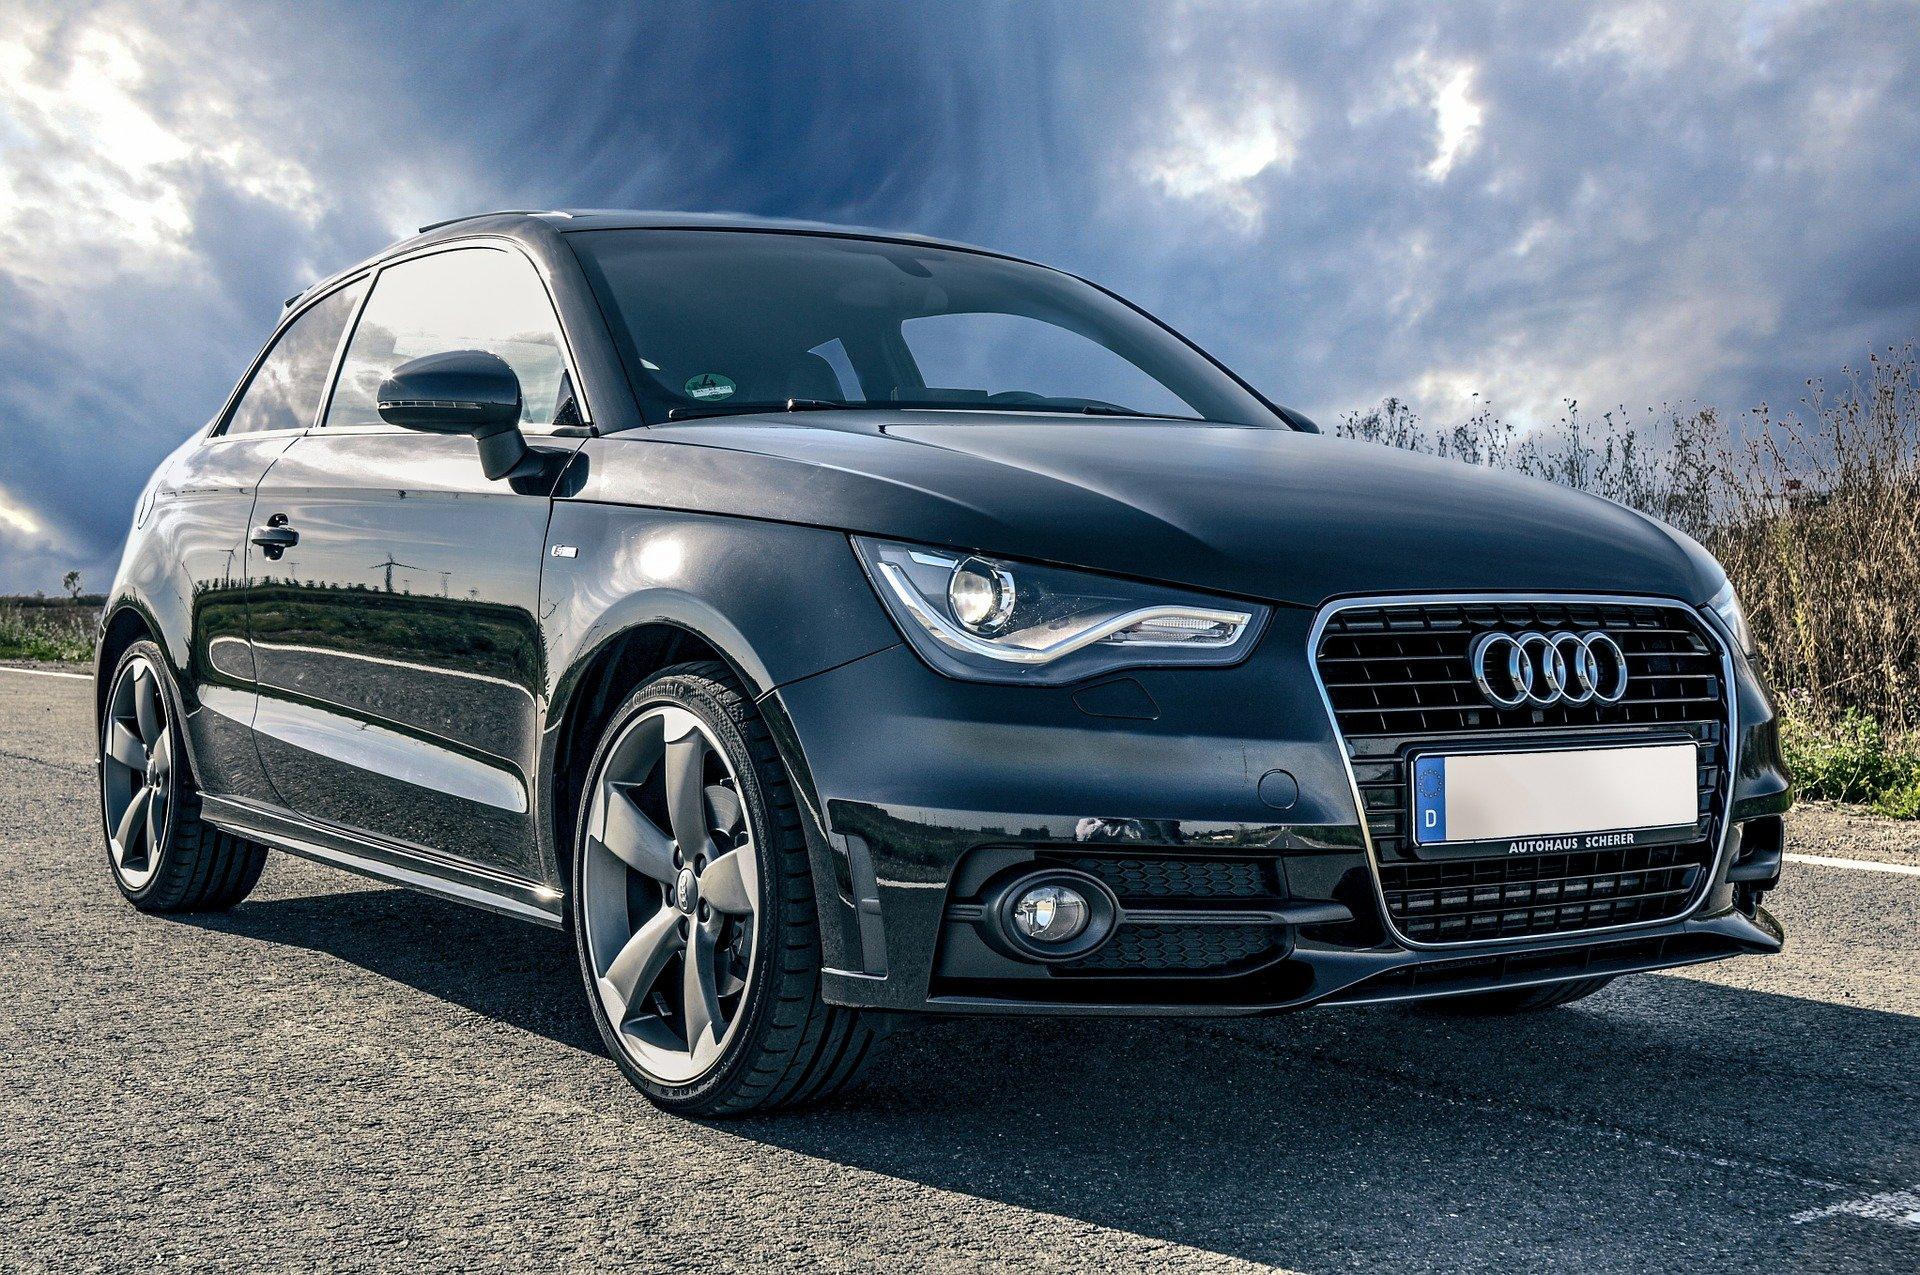 Black Audi A1